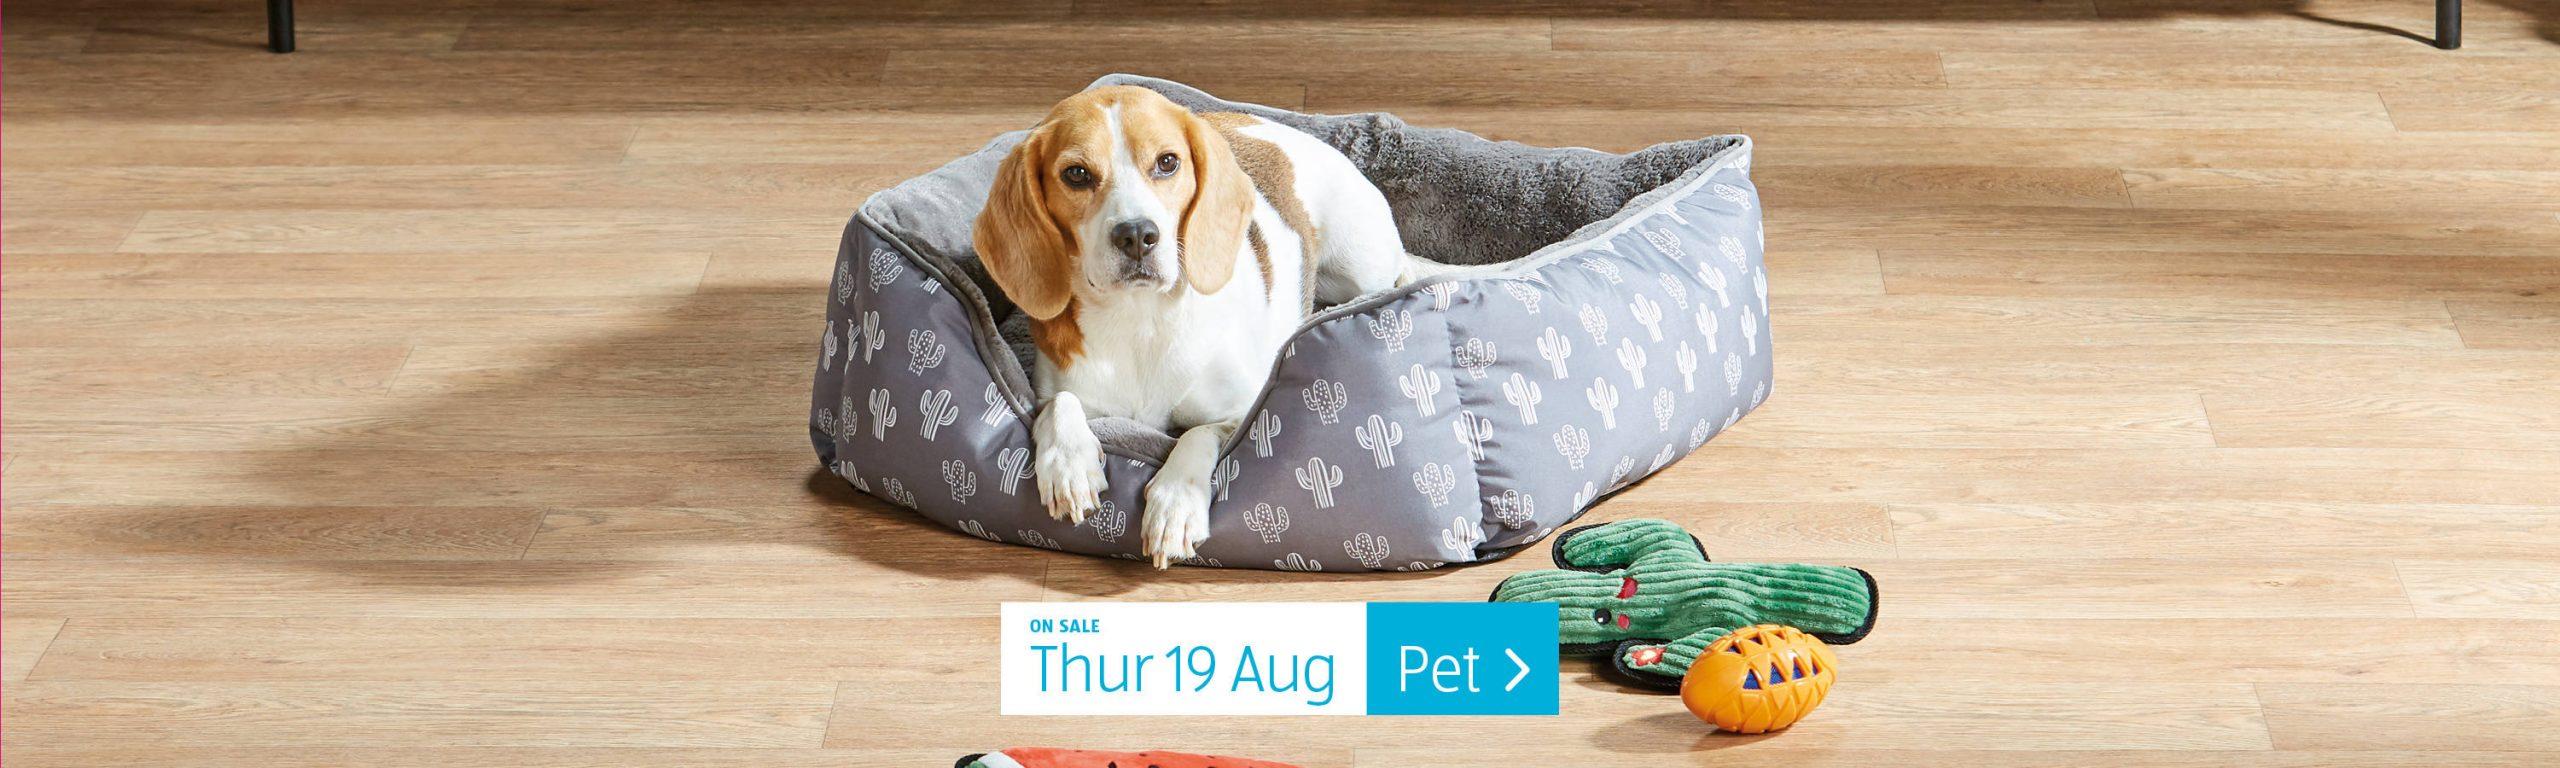 ALDI Pet 19th August 2021 ALDI Thursday Offers